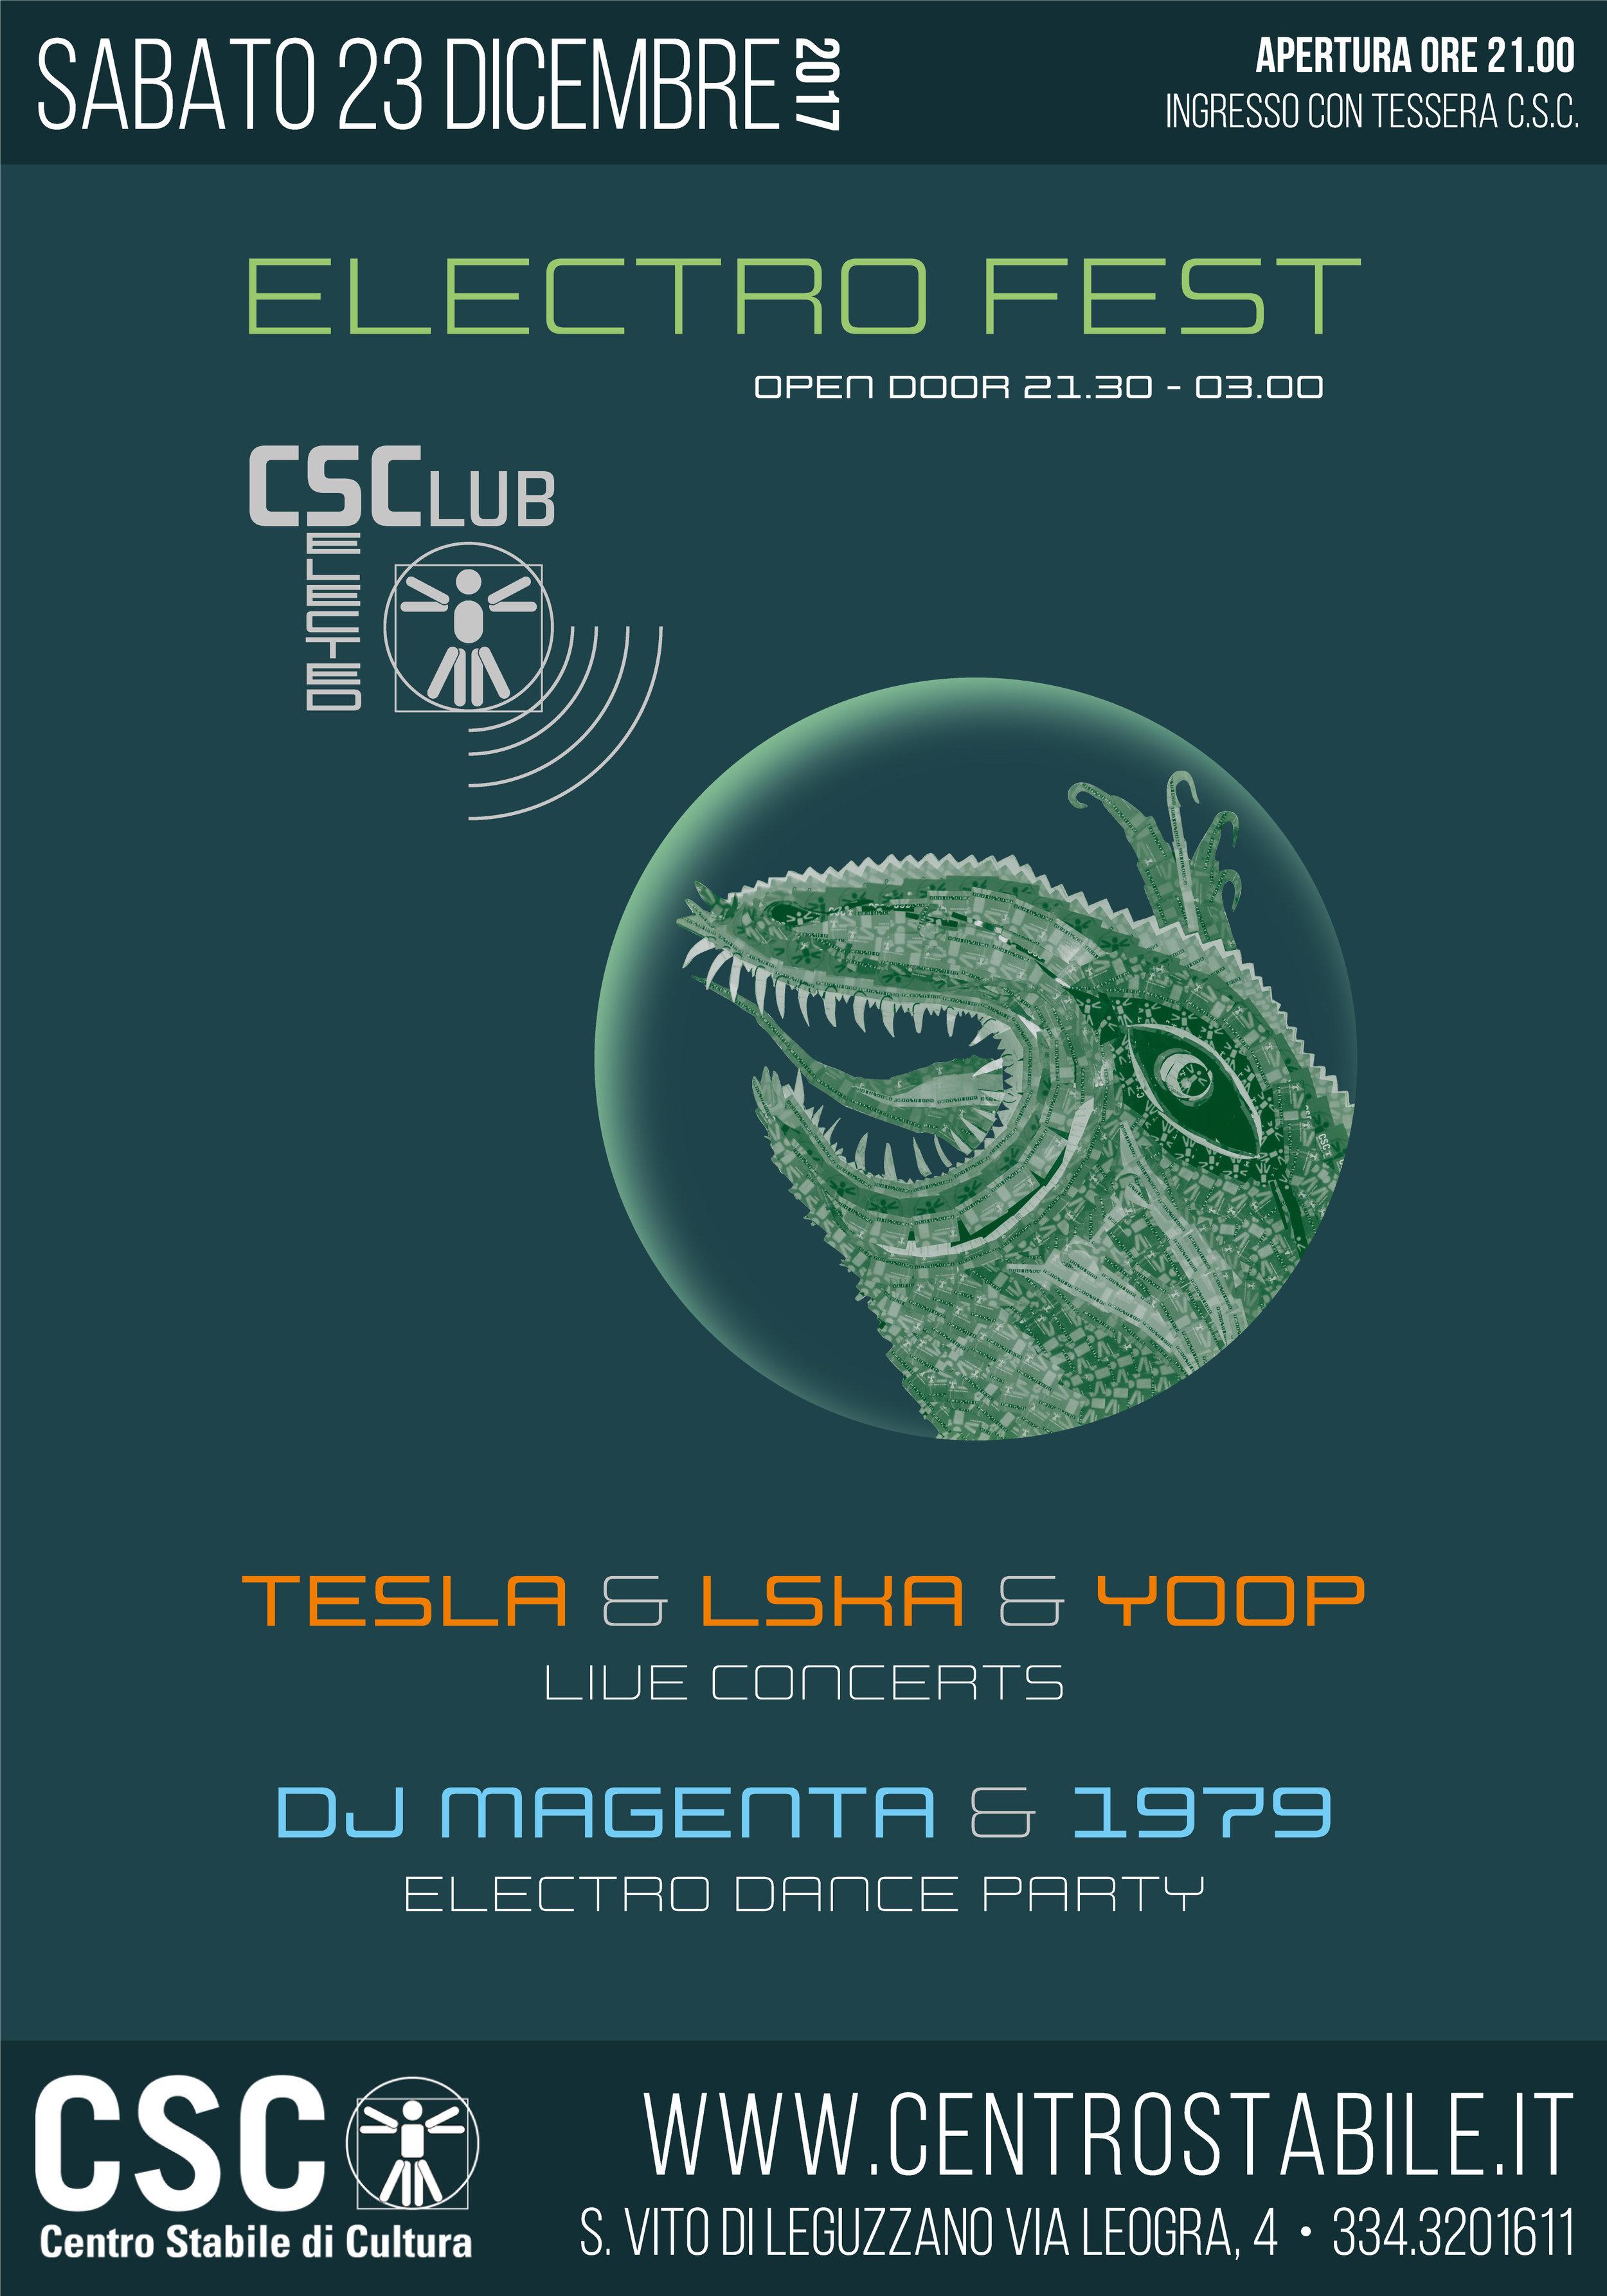 electrofest_locandina_2.jpg